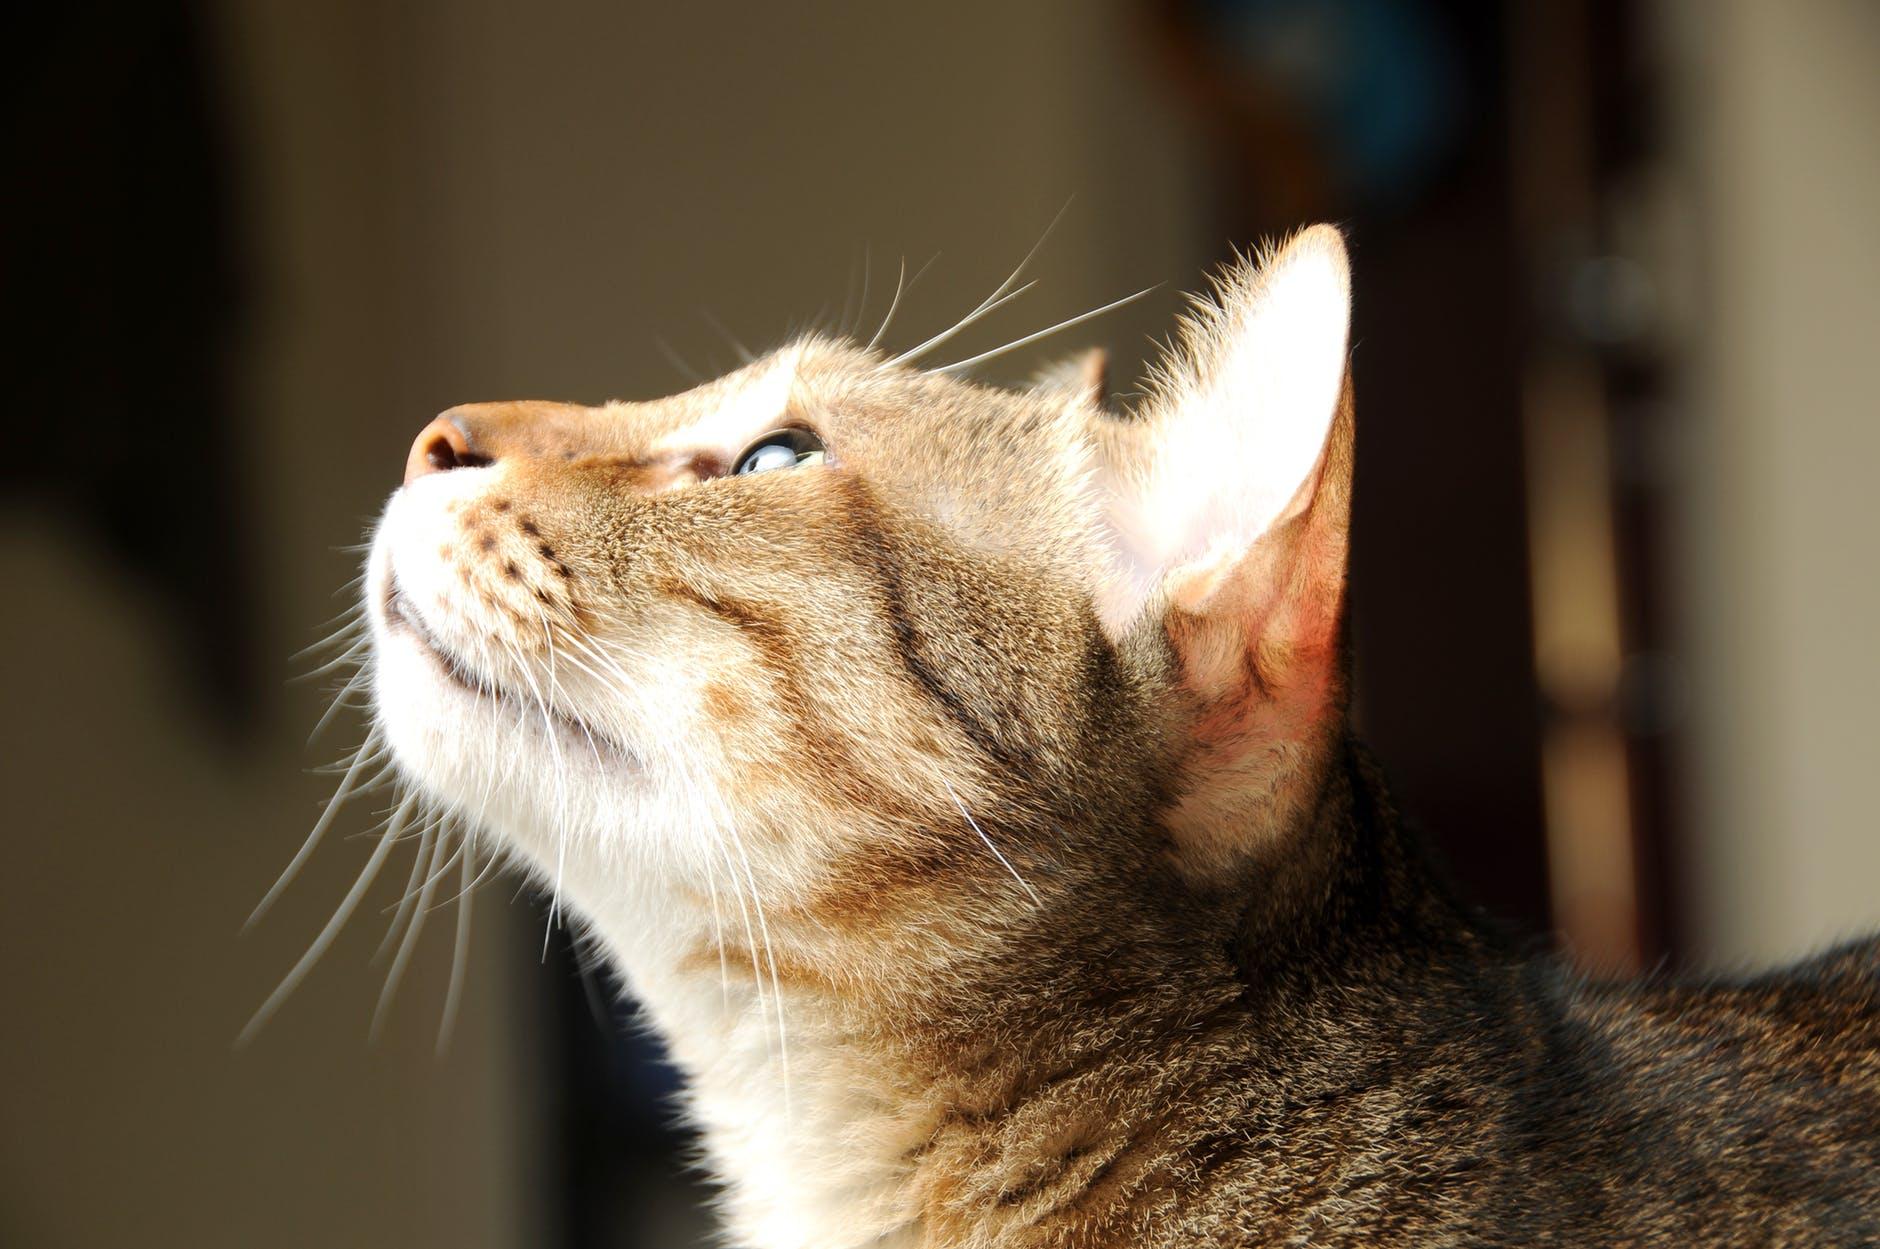 adorable animal cat cat face